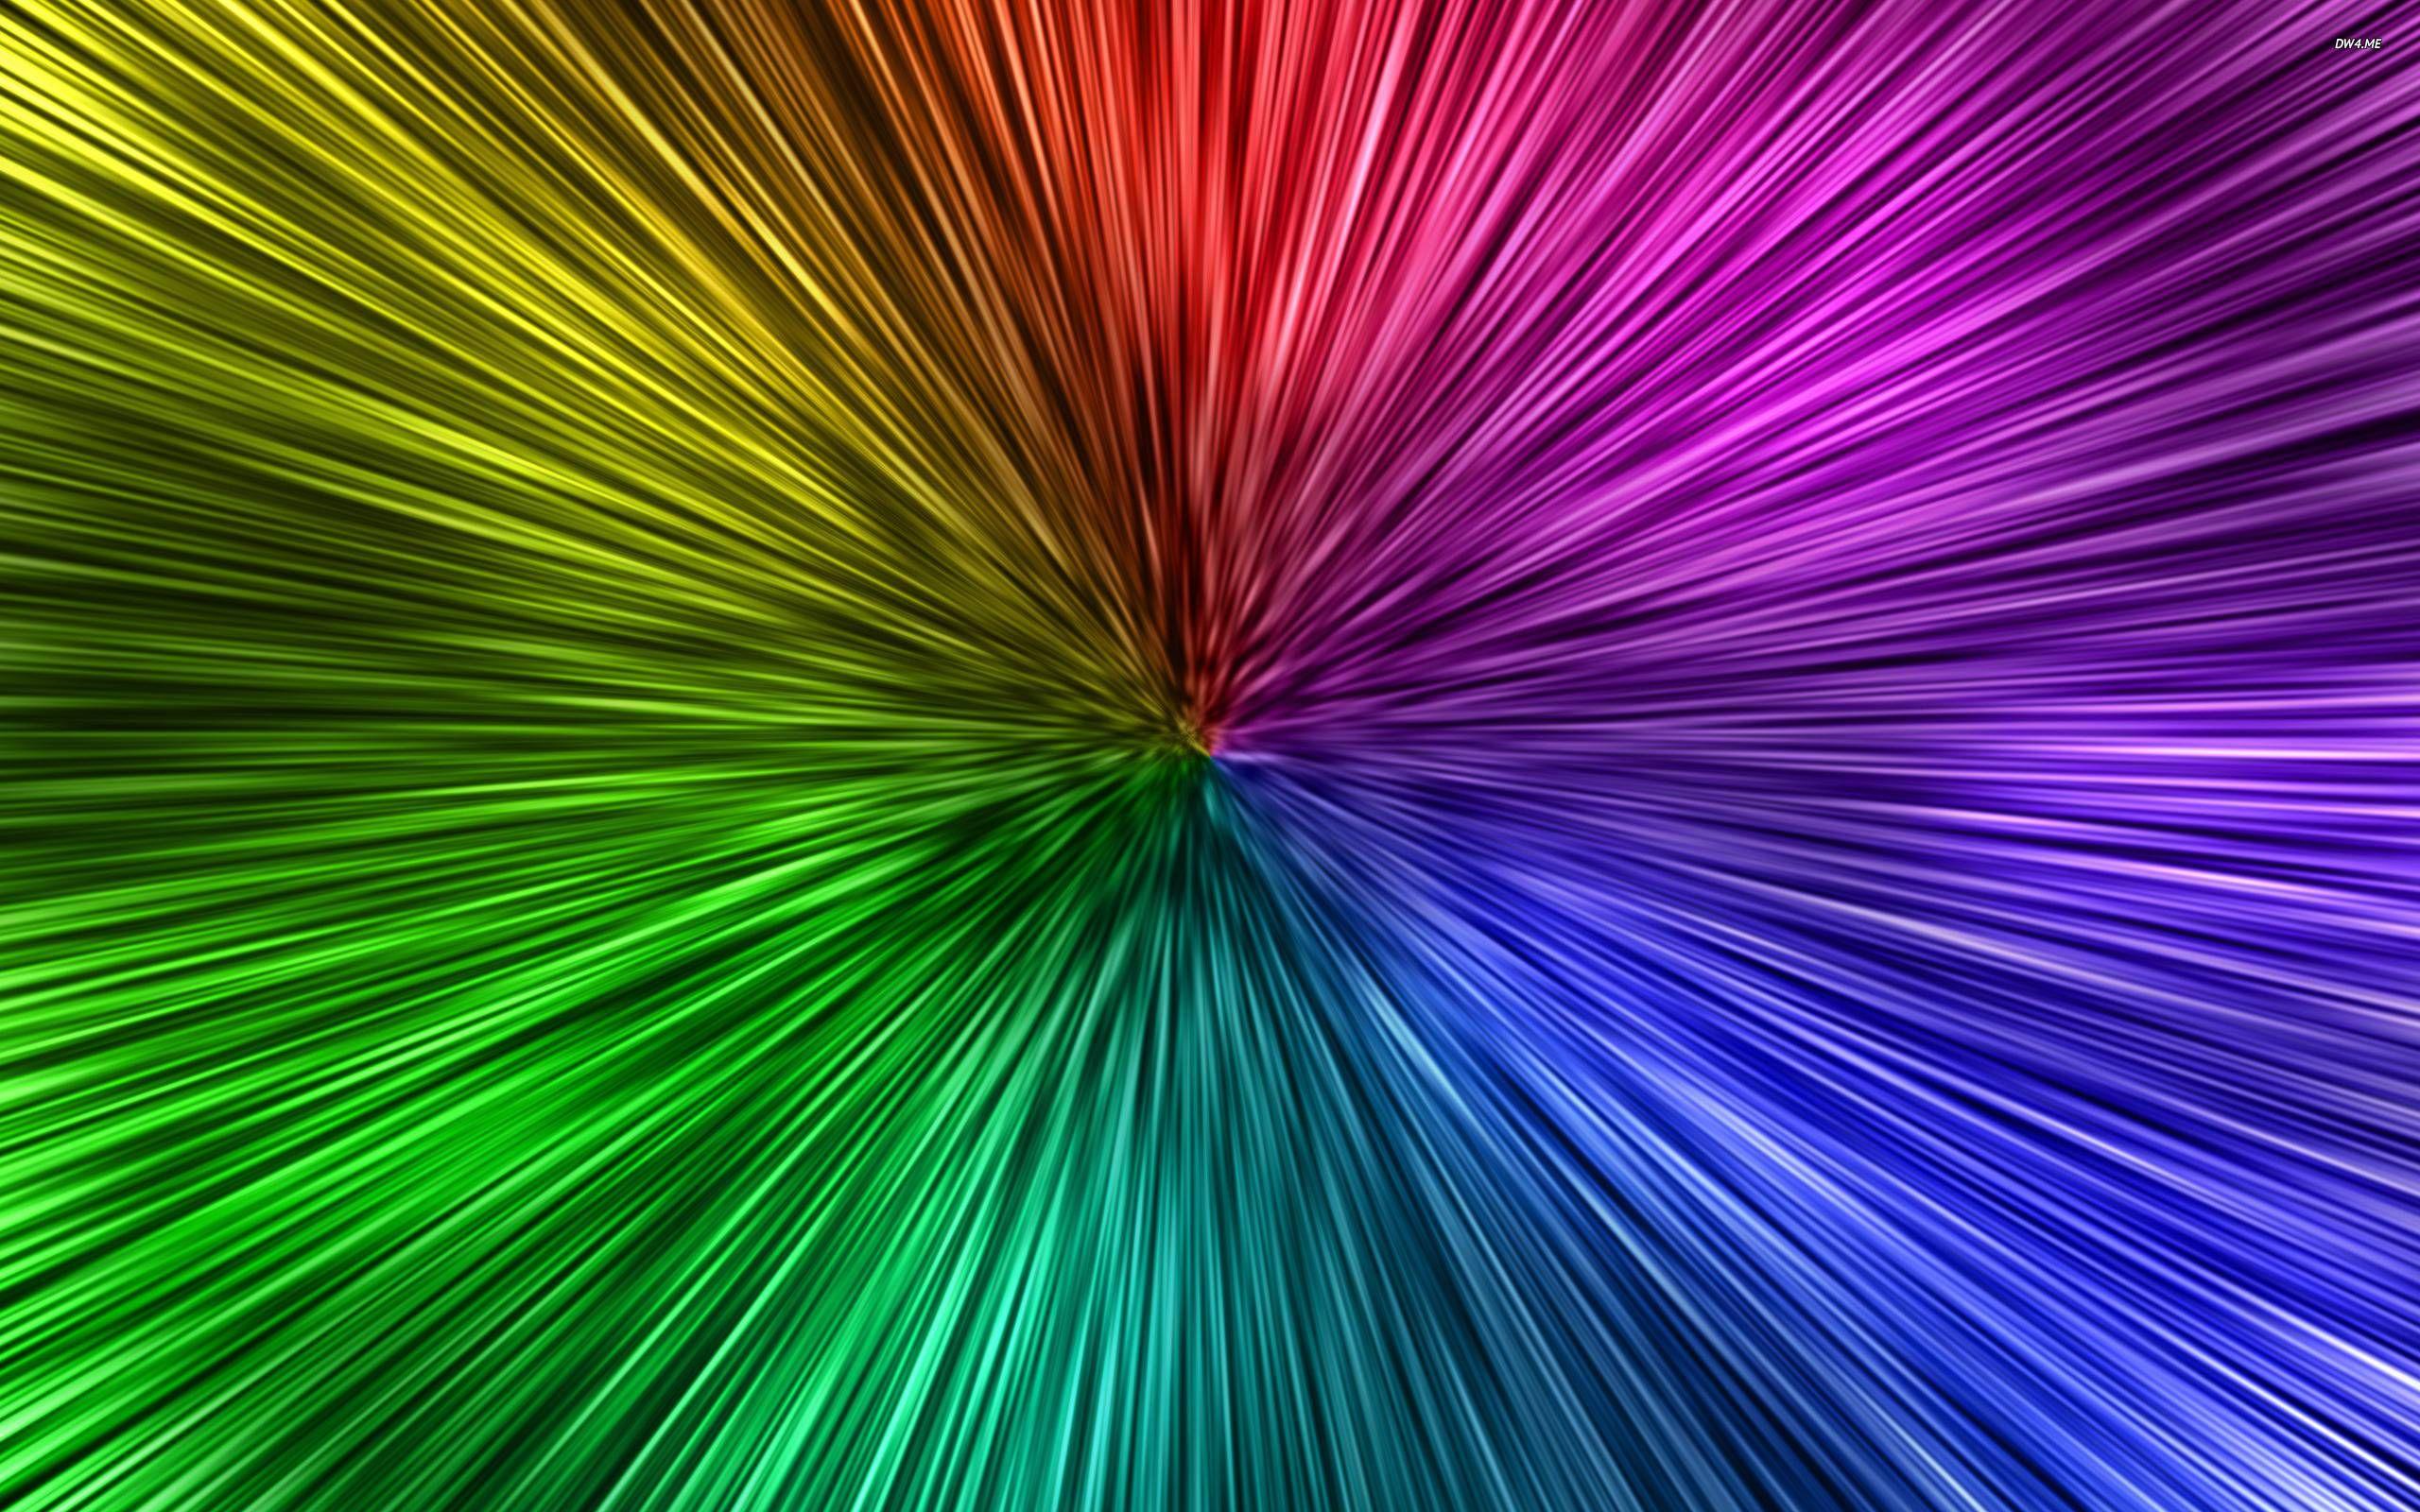 Dye Tie Rainbow Screensaver